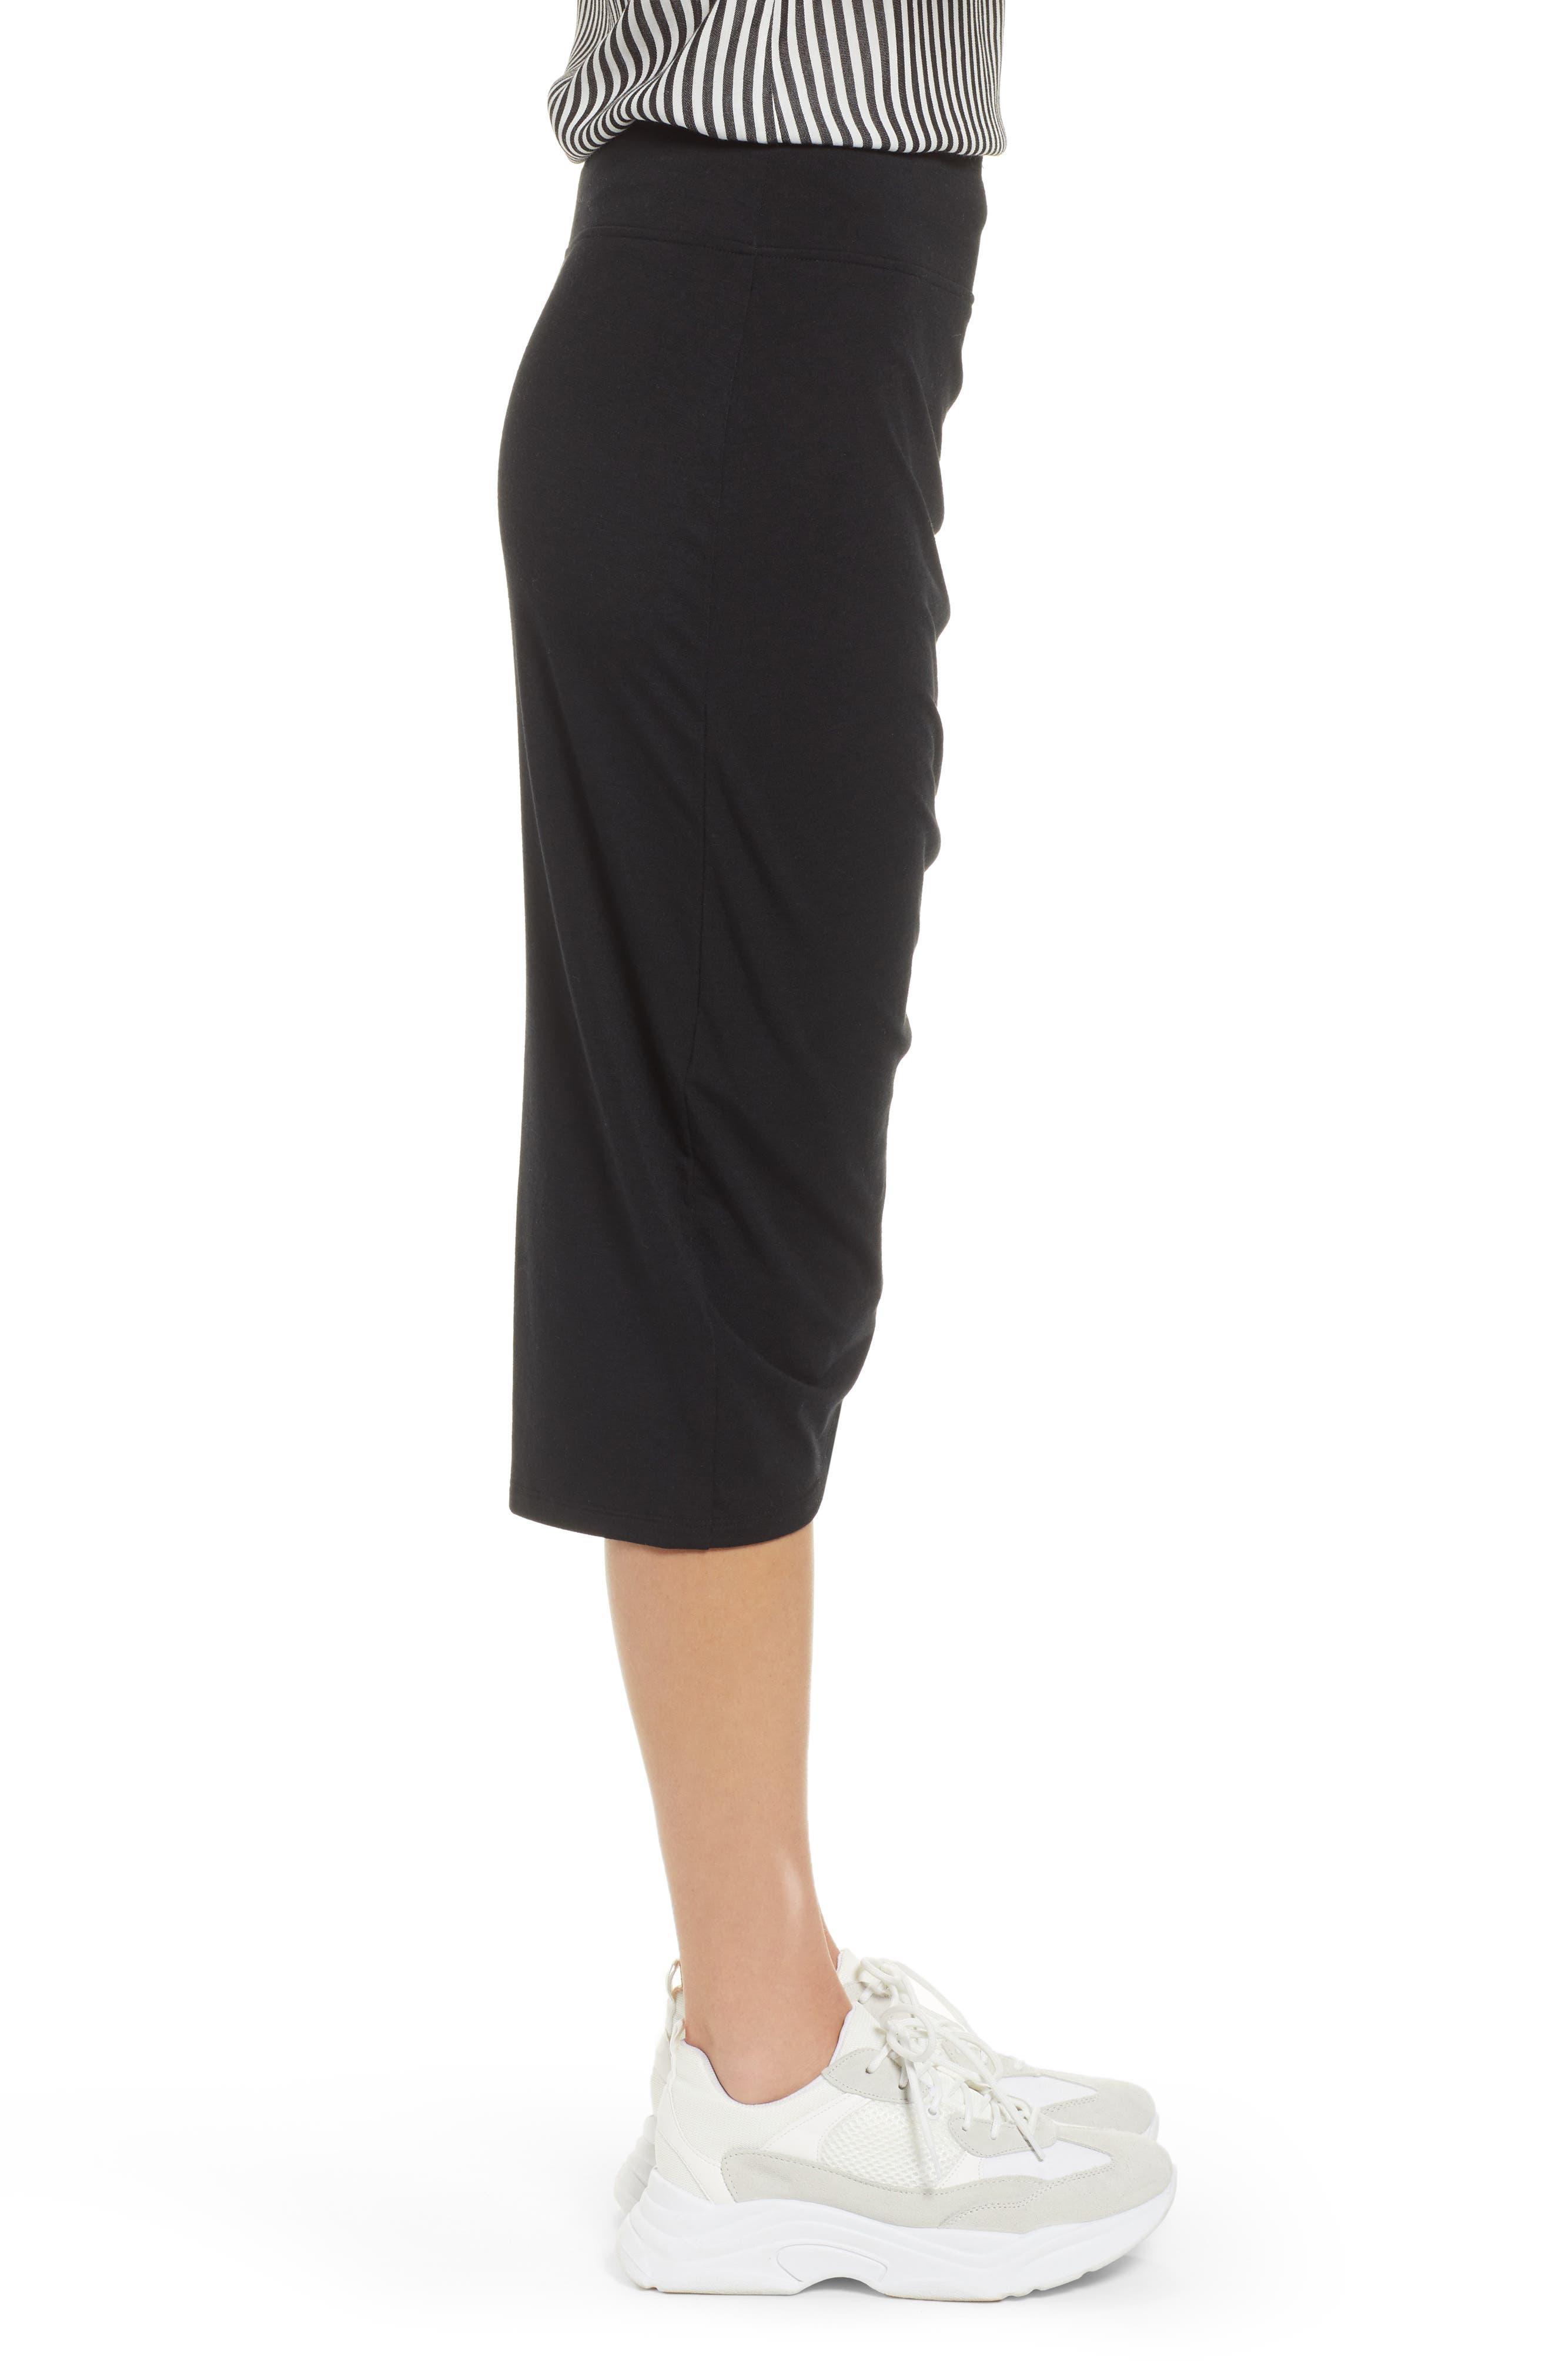 TREASURE & BOND, Shirred Side Midi Skirt, Alternate thumbnail 3, color, BLACK